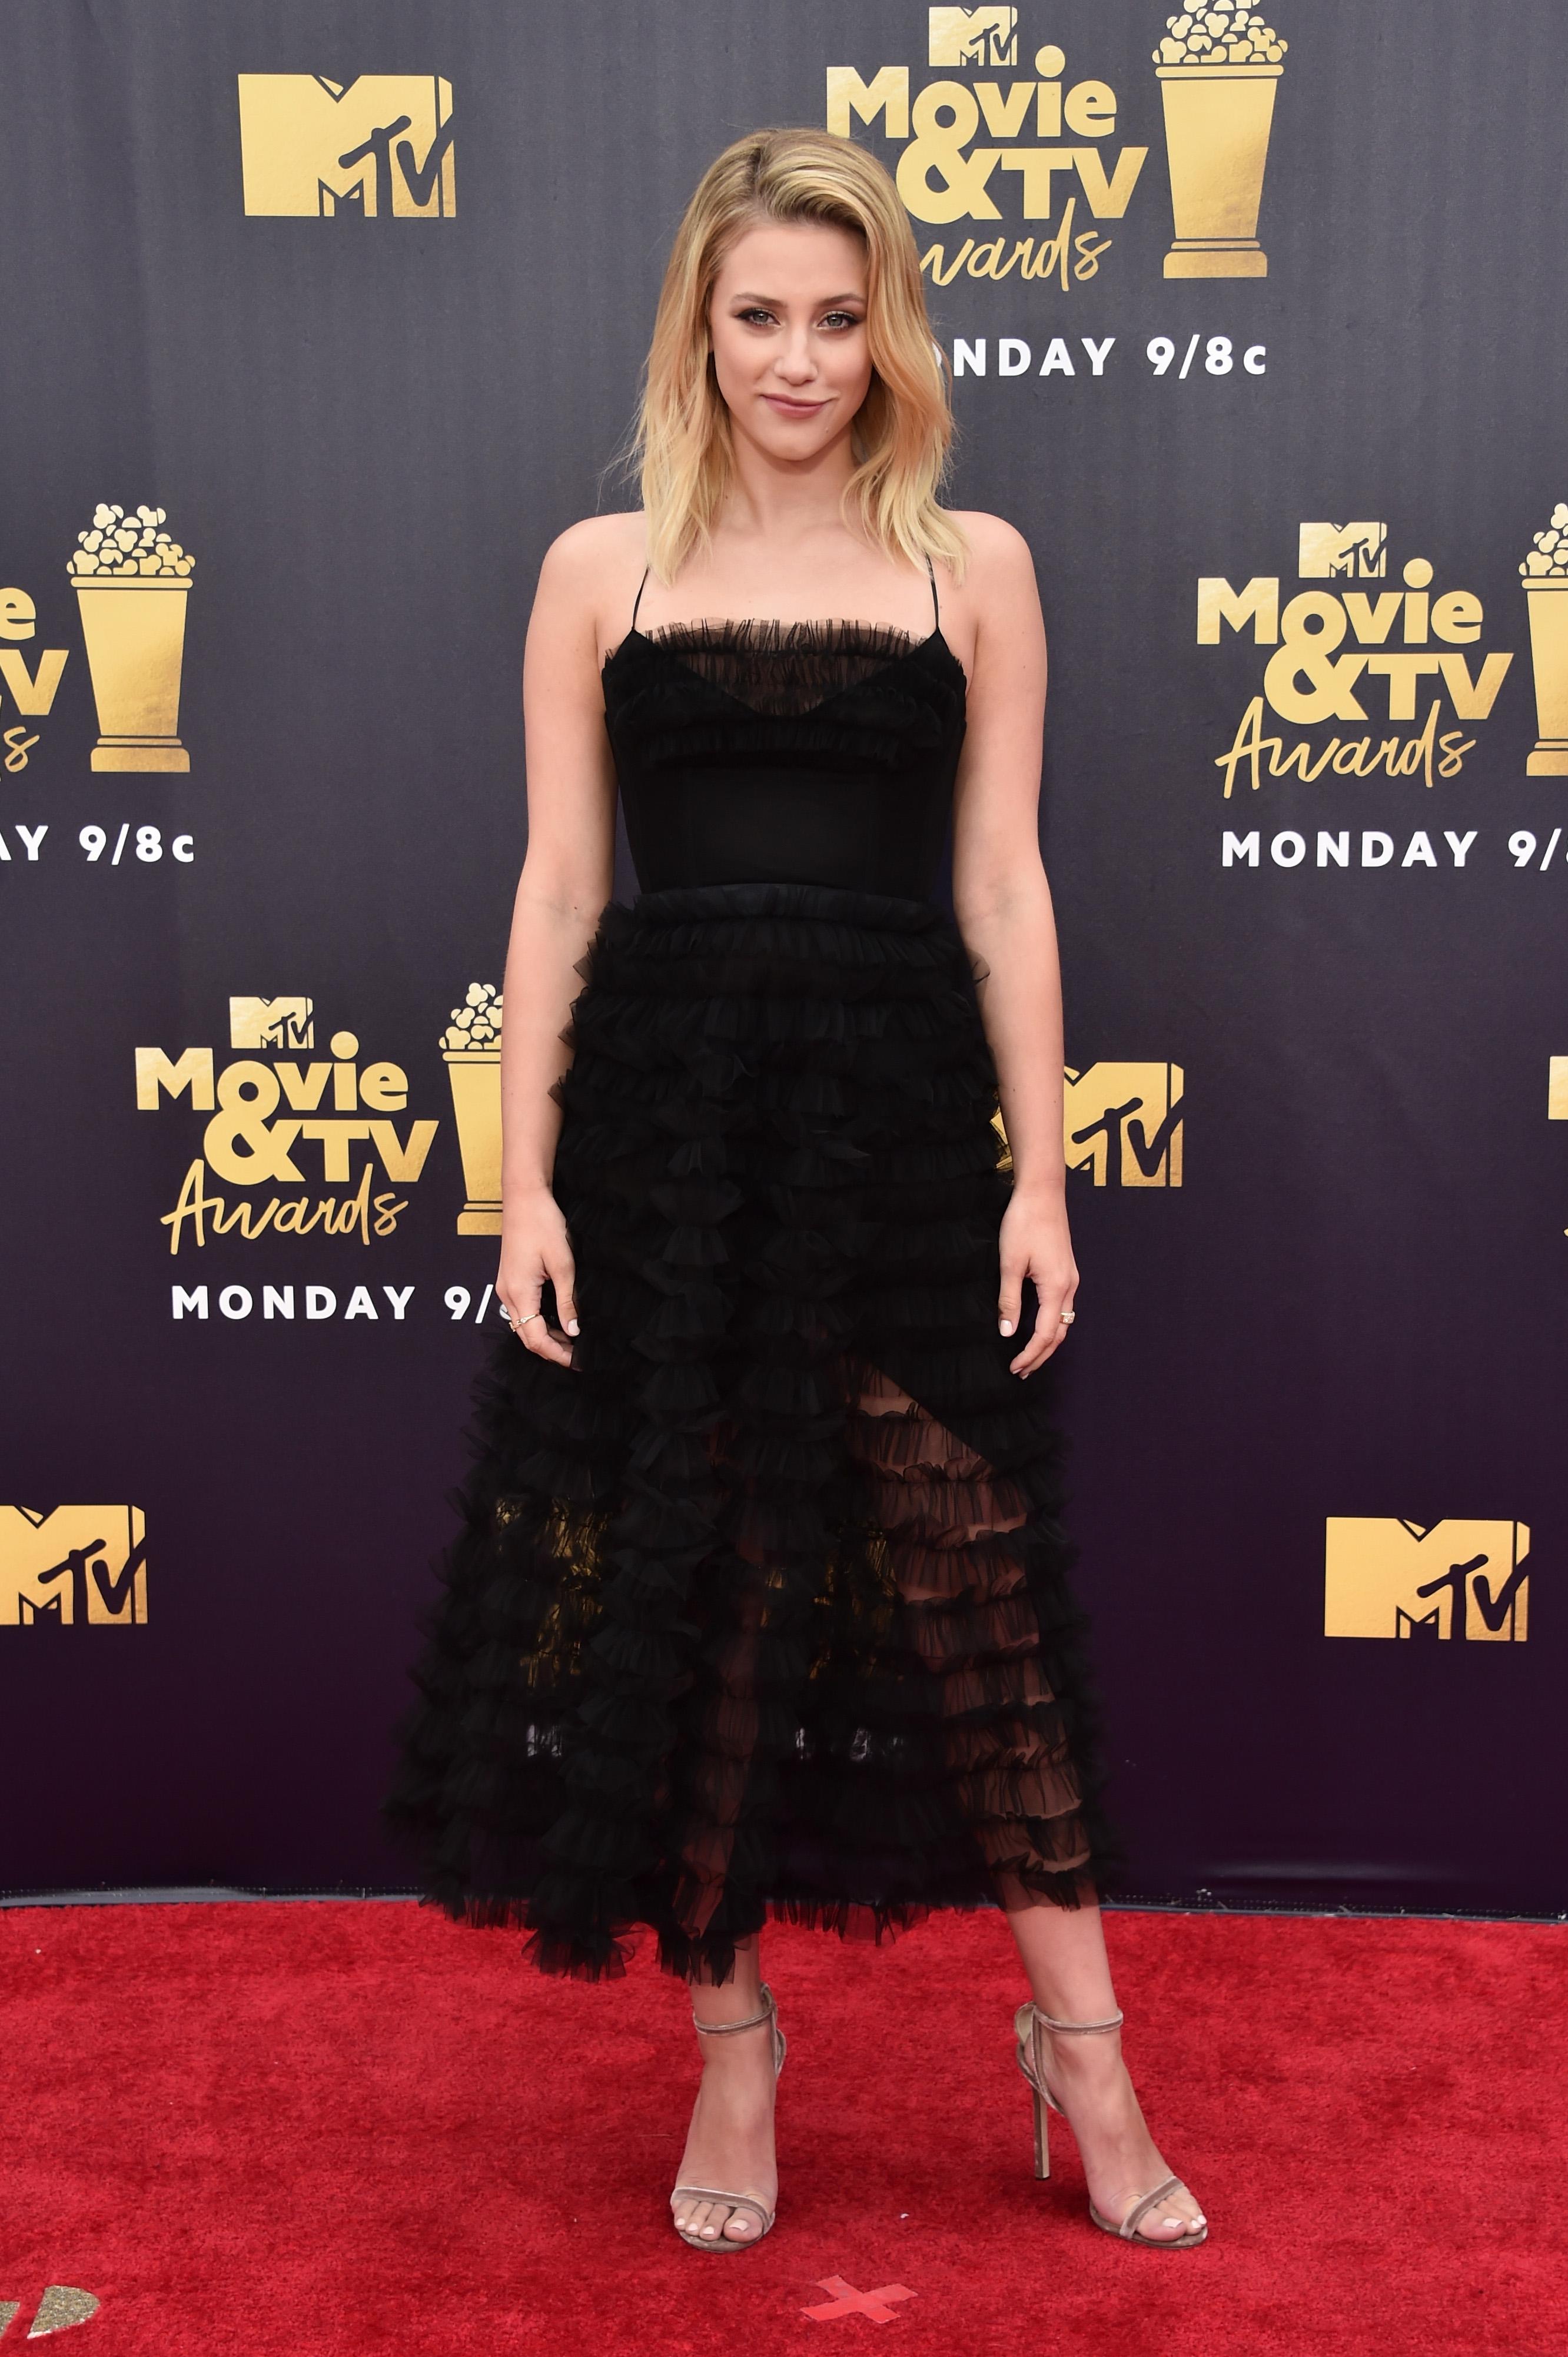 lili-reinhart-MTV Movie And TV Awards 2018